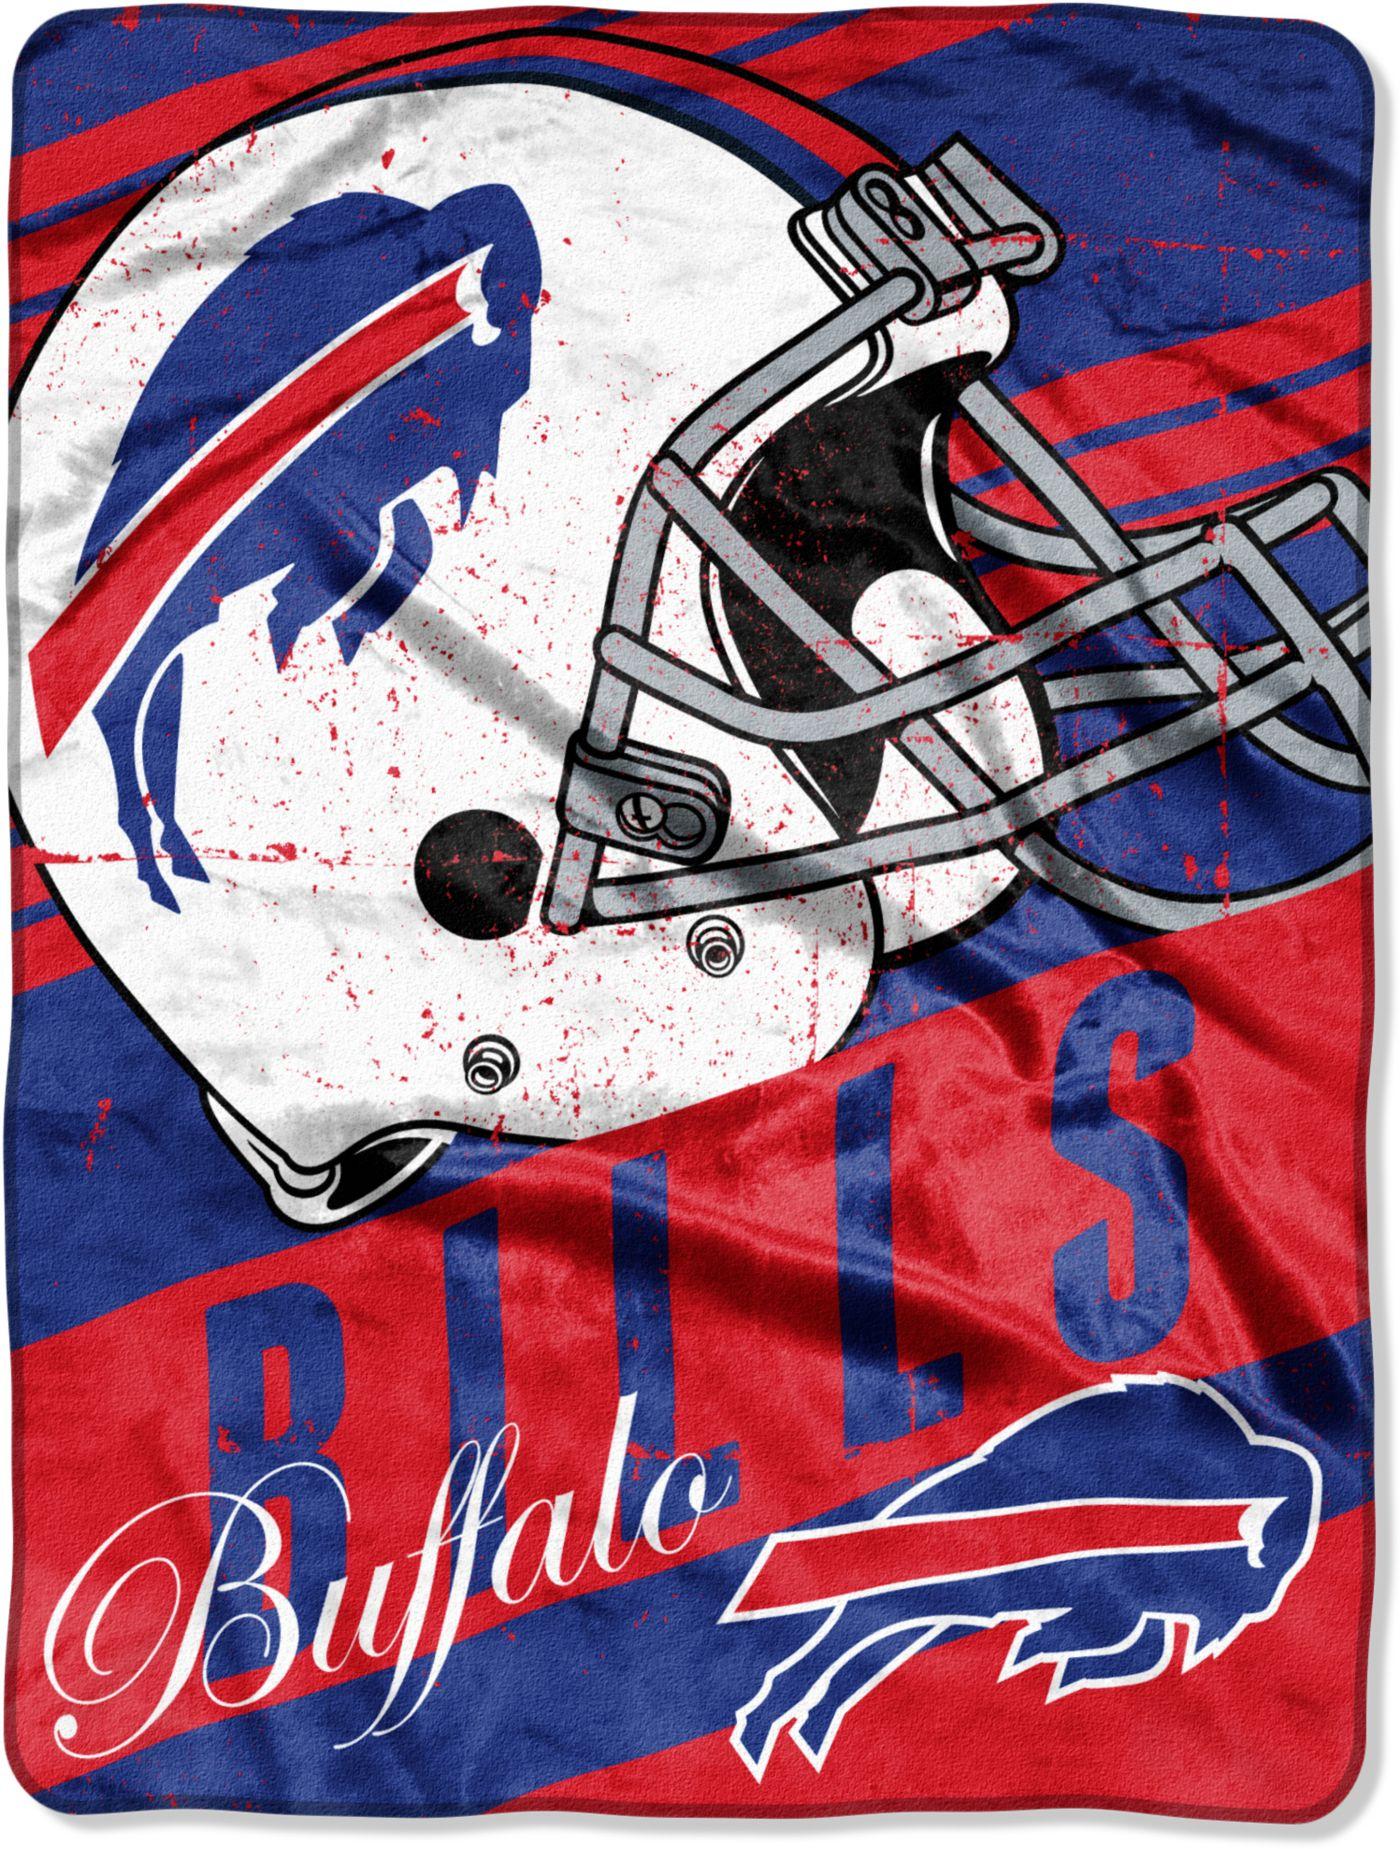 Northwest Buffalo Bills Slant Blanket